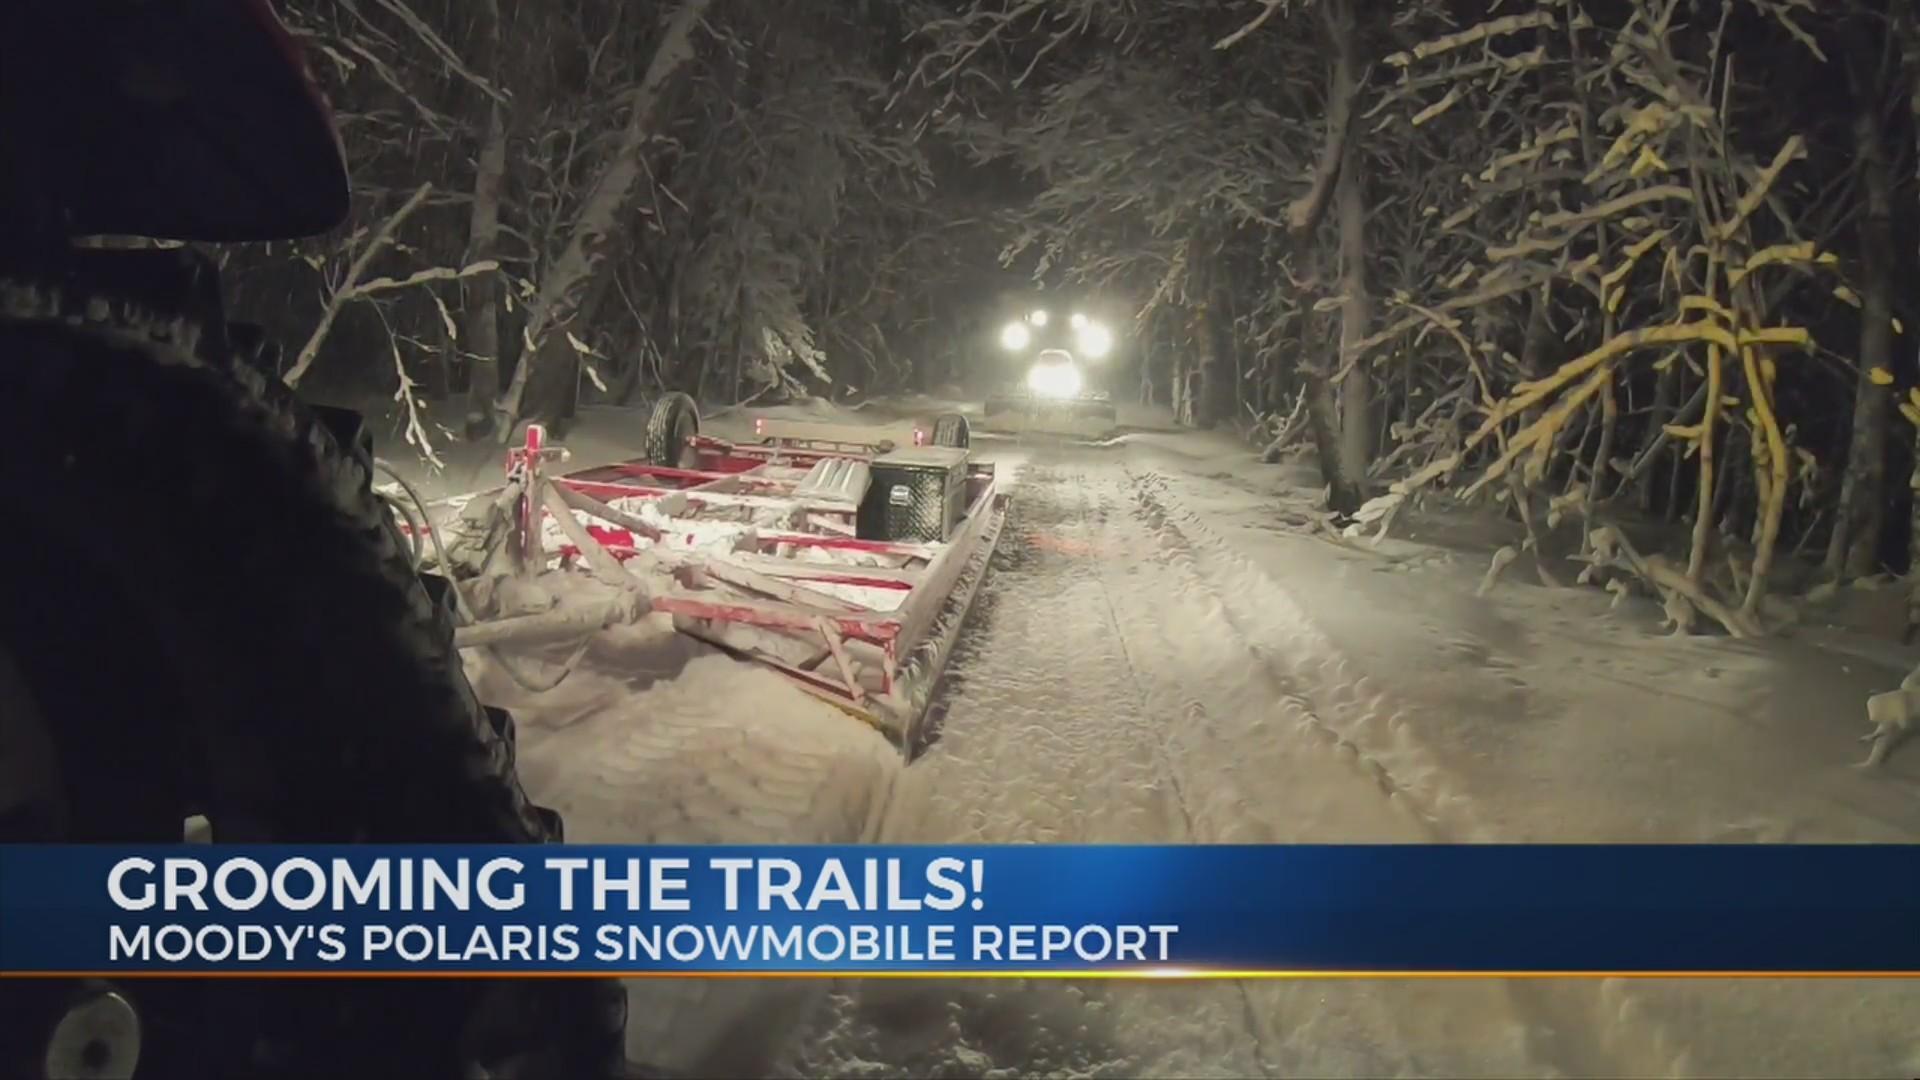 Moody's Polaris Snowmobile Report 1-10